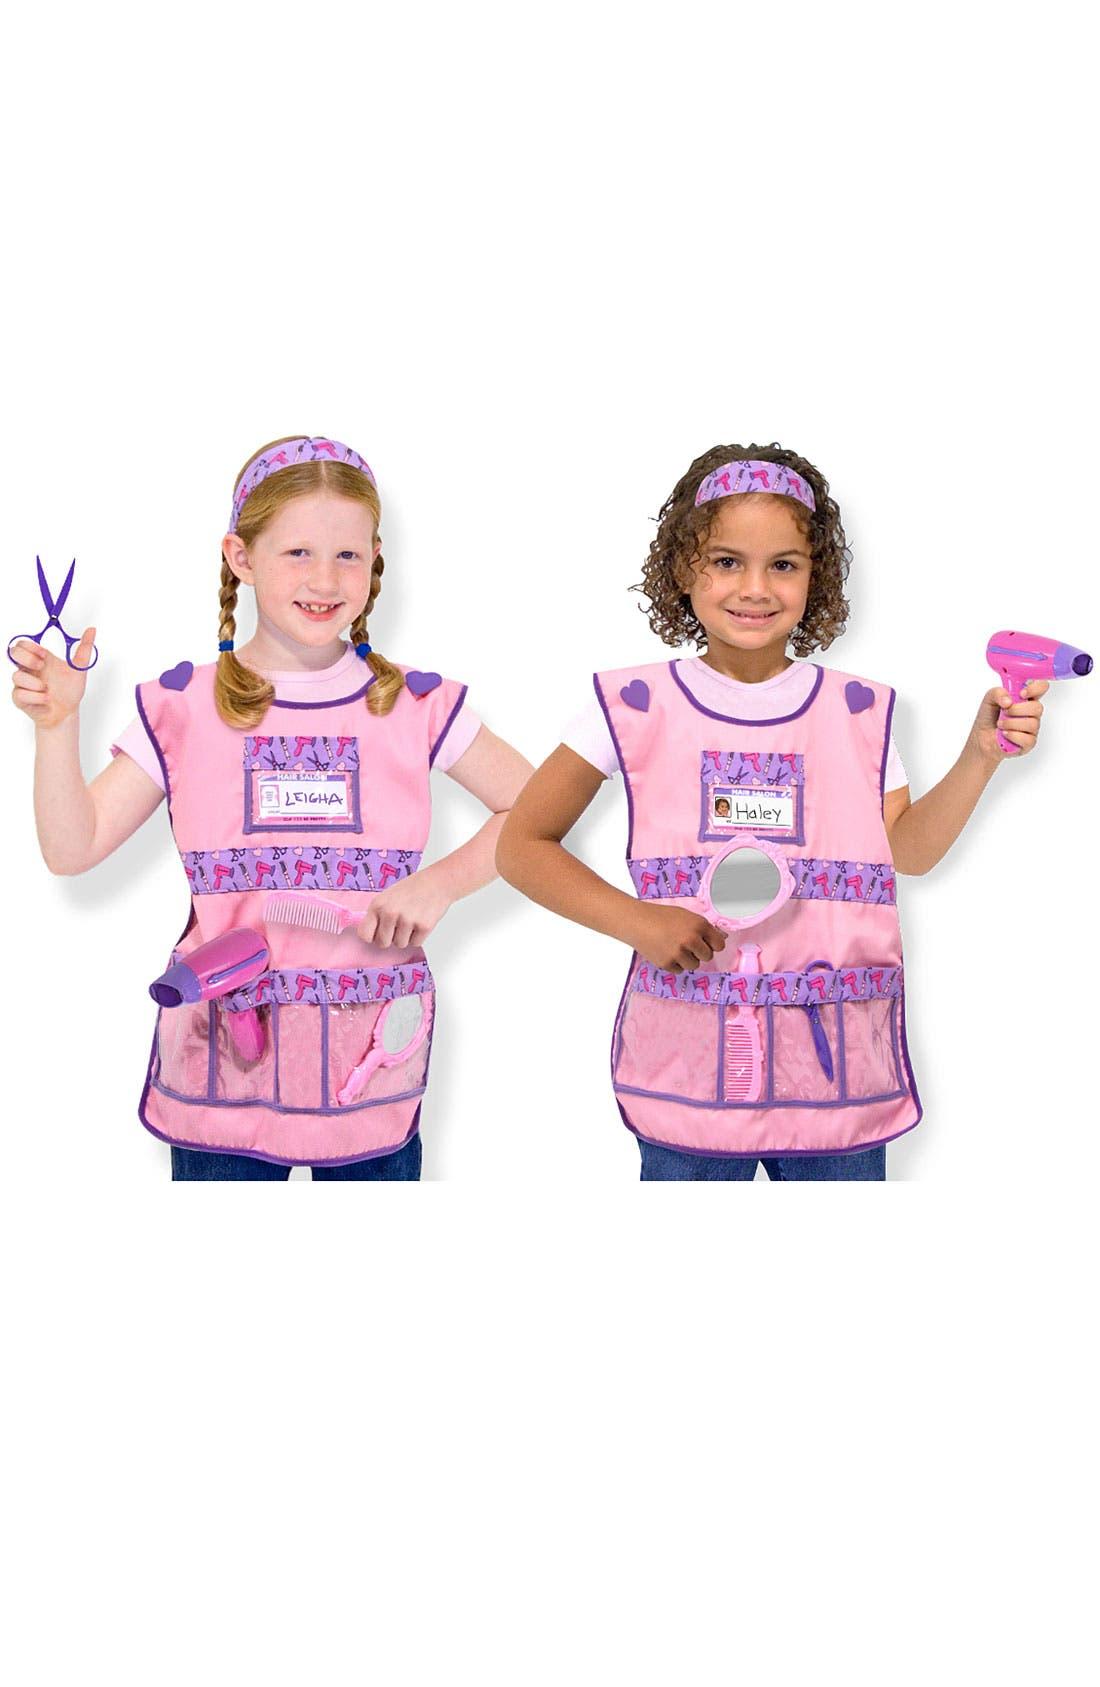 MELISSA & DOUG 'Hair Stylist' Costume